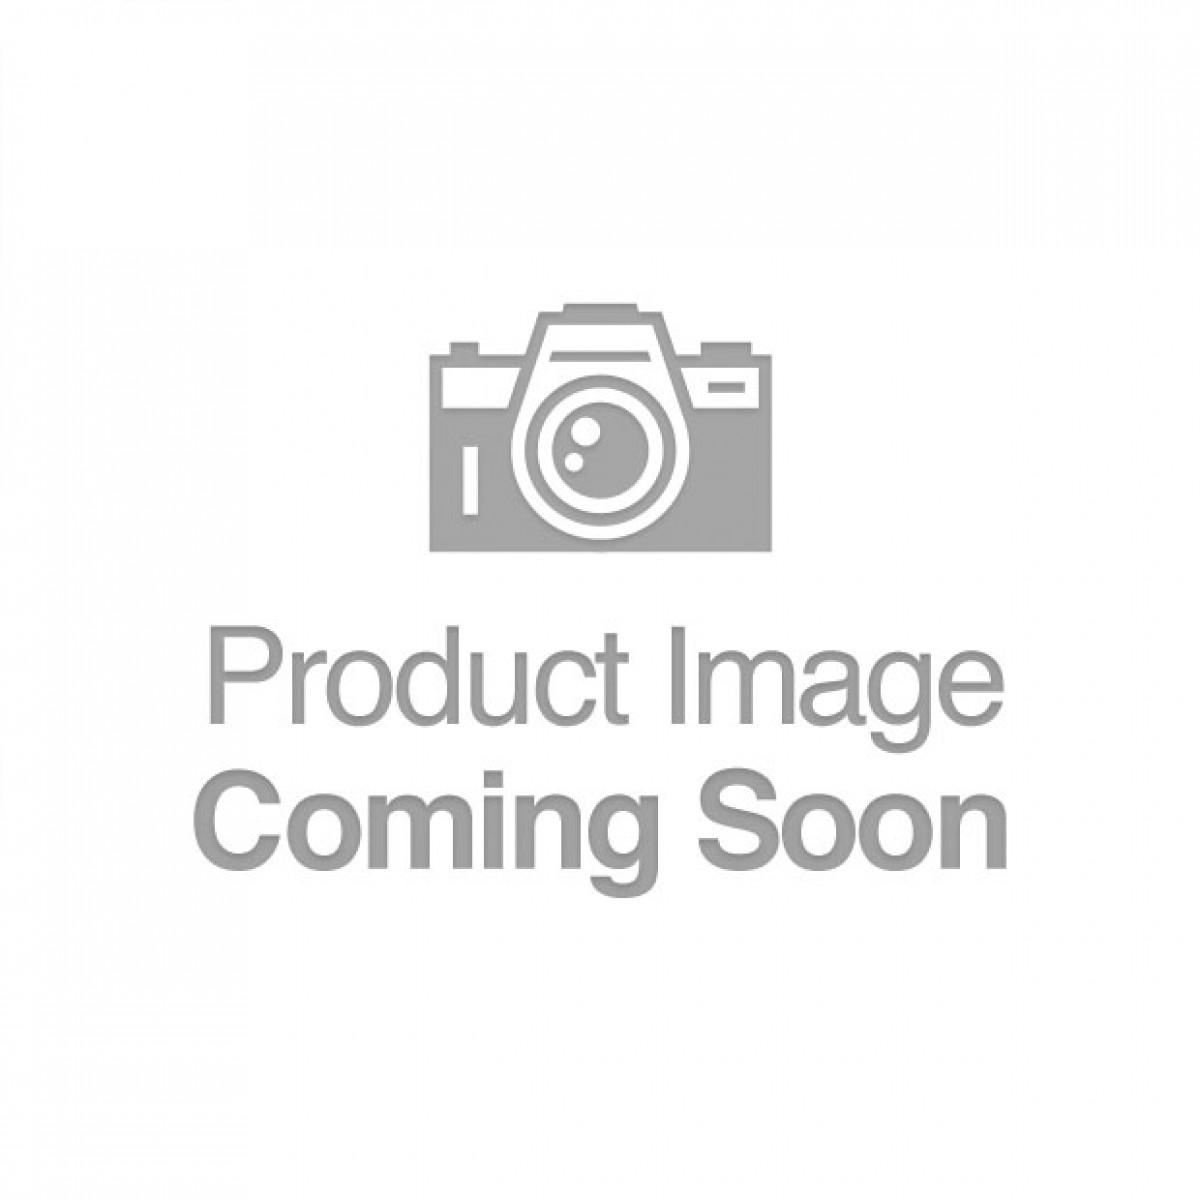 Forto F-31 Silicone Plug - Medium Black